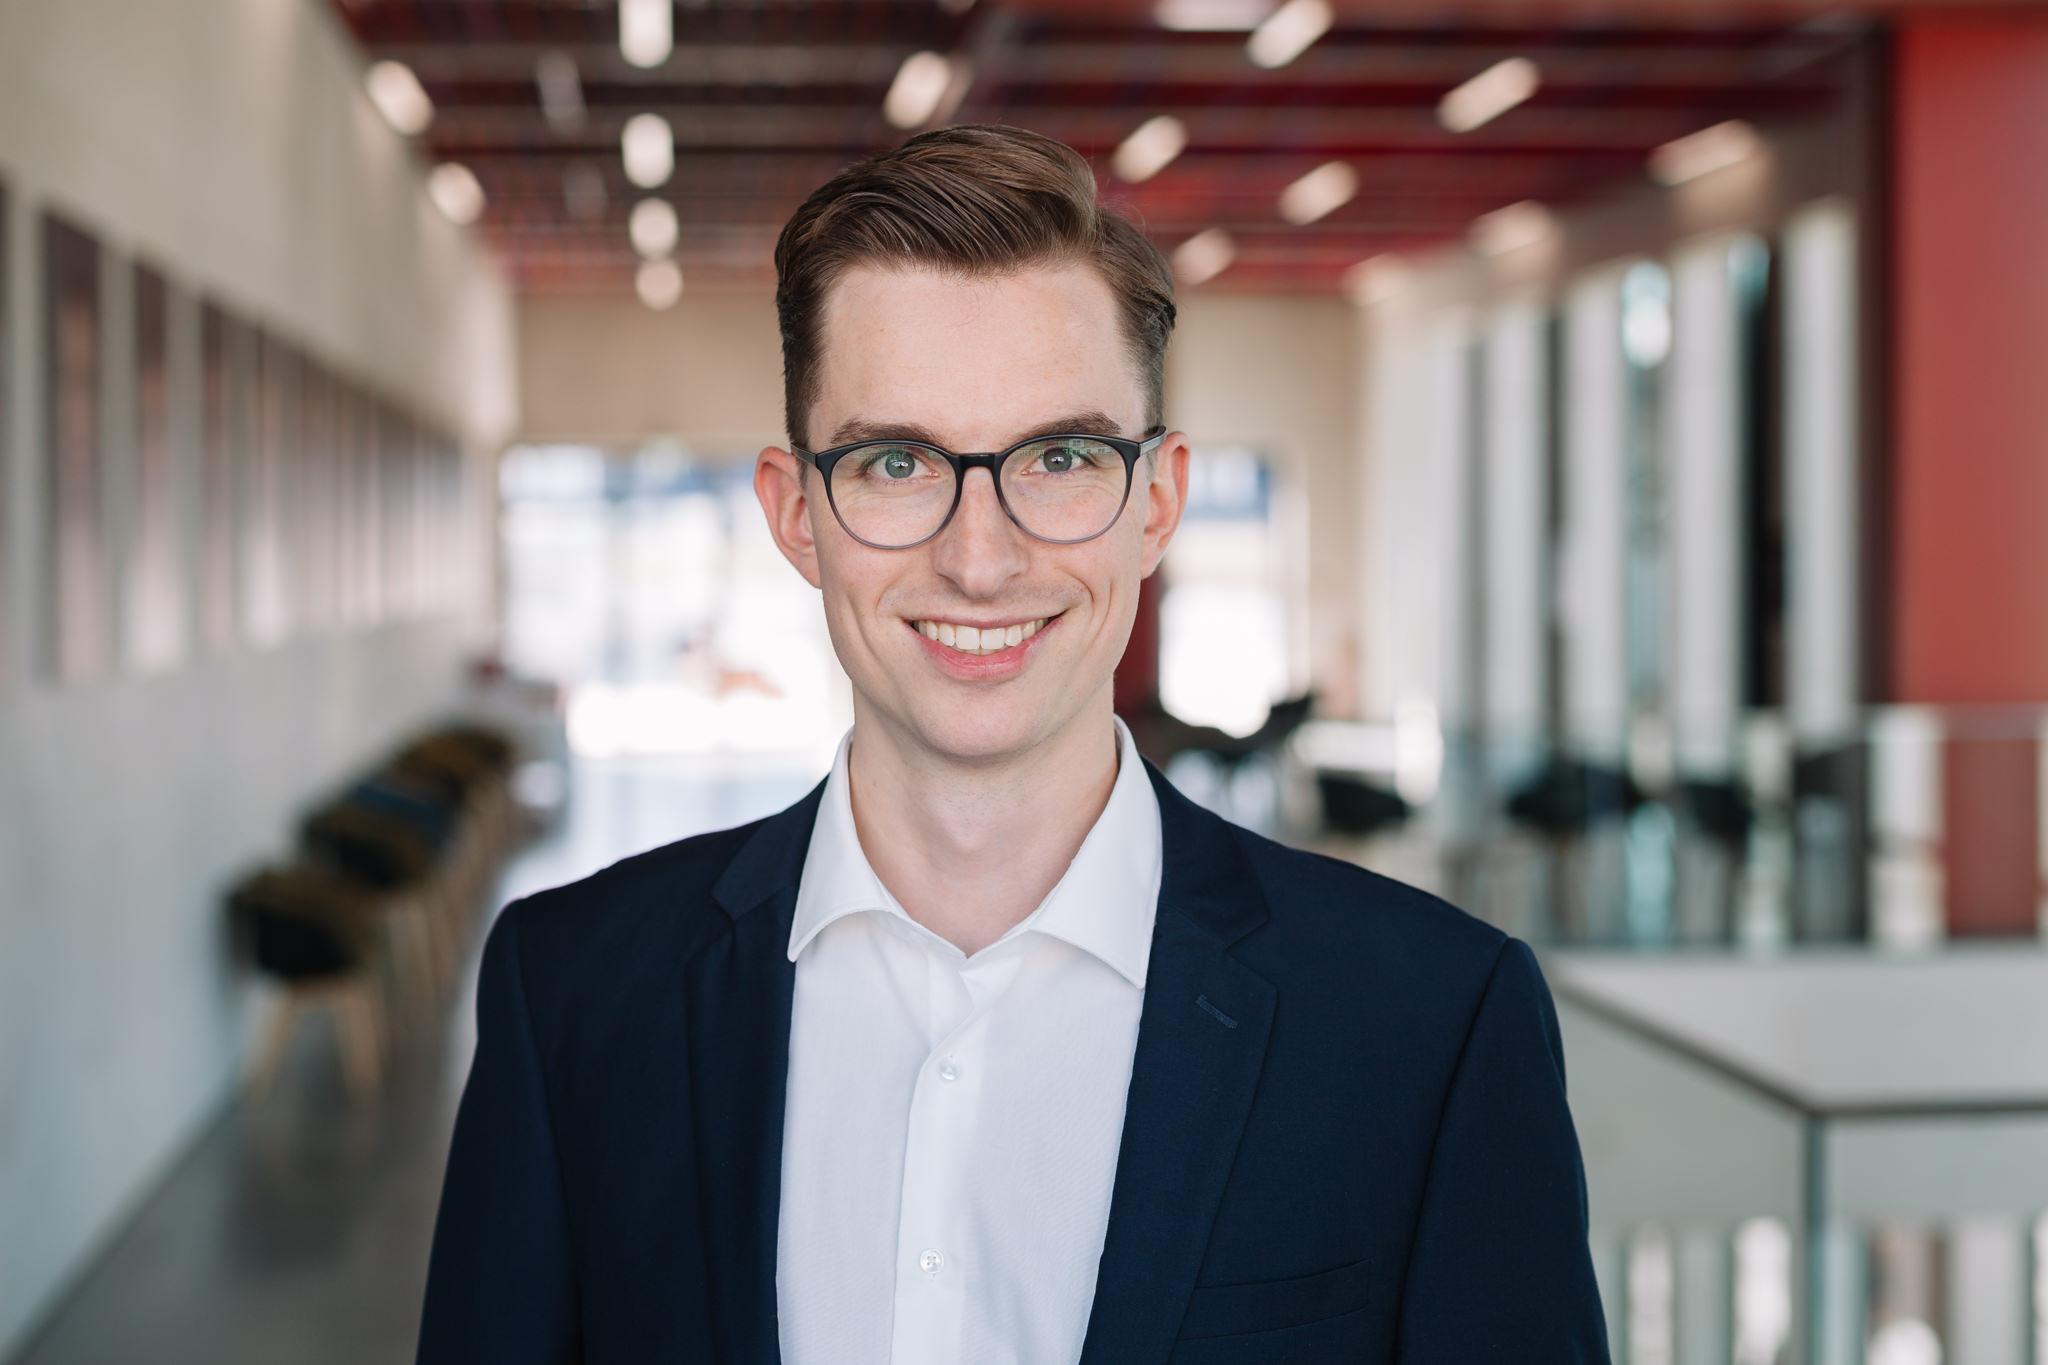 Daniel Business Portrait.jpg